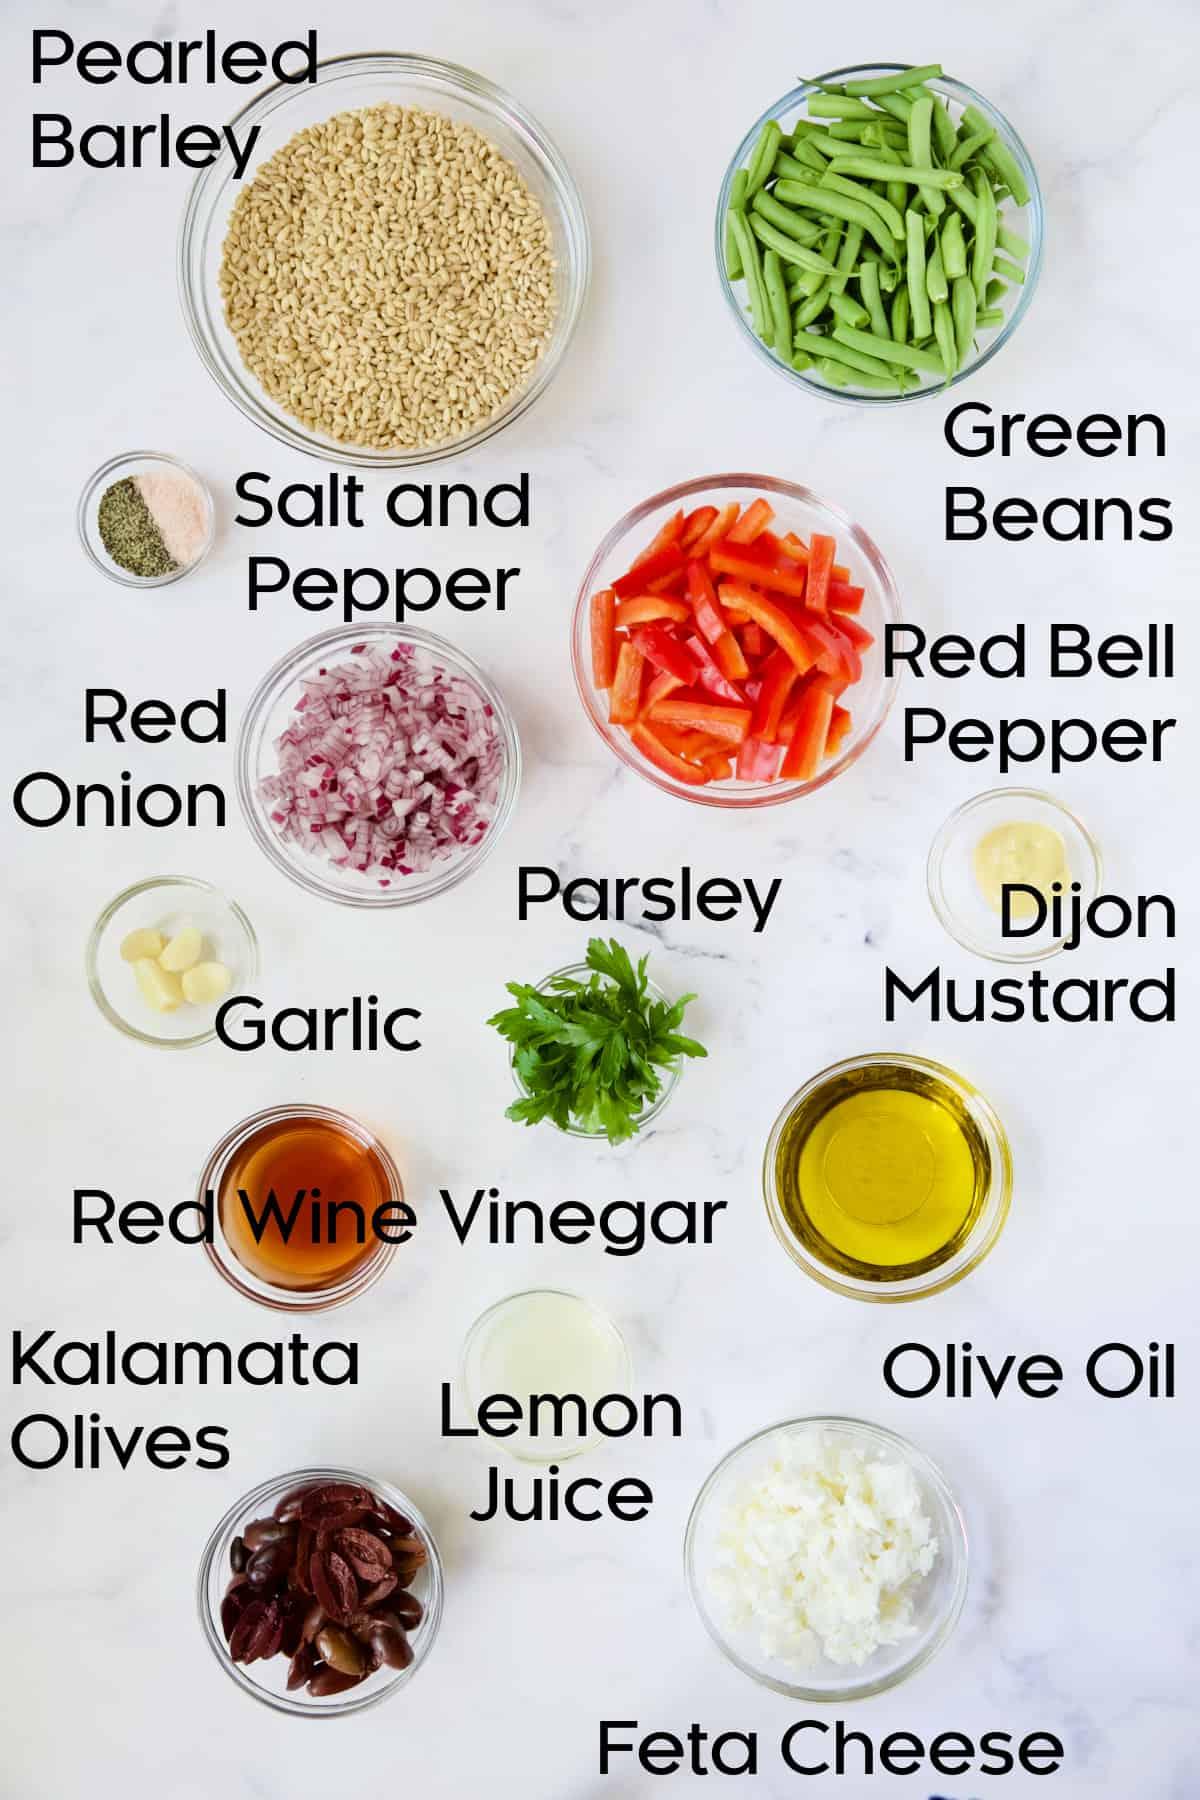 Ingredients for Mediterranean Barley Salad in glass bowls.